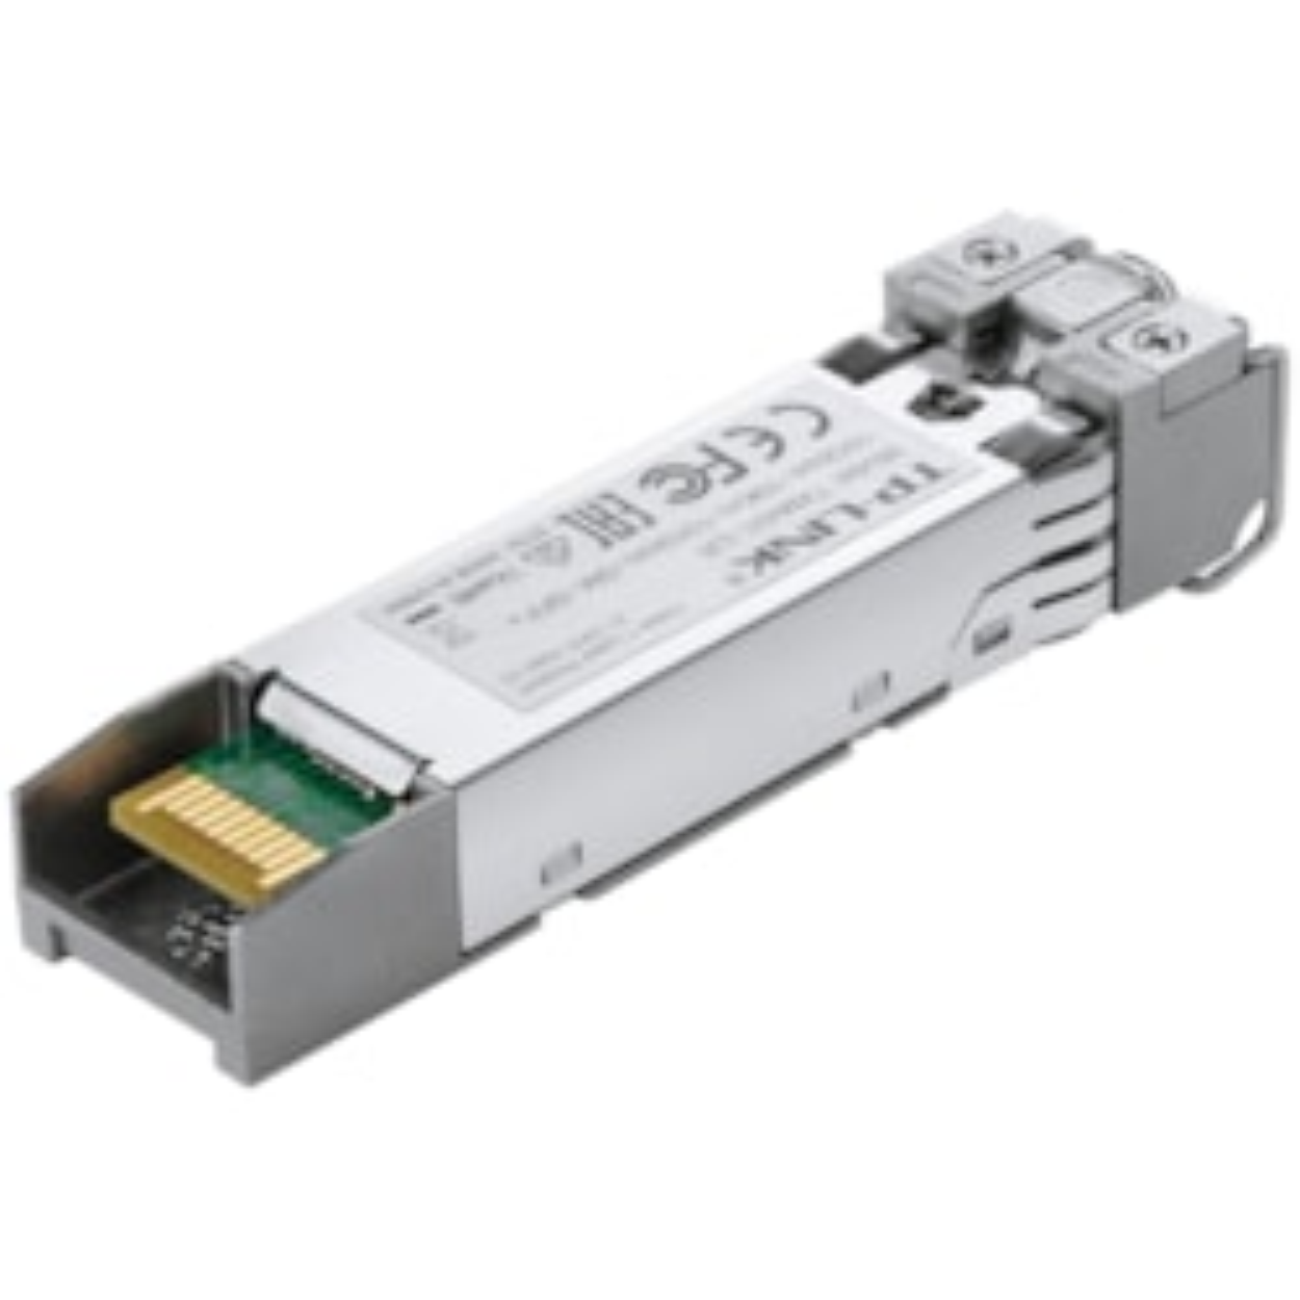 TP-LINK TXM431-LR SFP+ - 1 LC/UPC 10GBase-LR Network